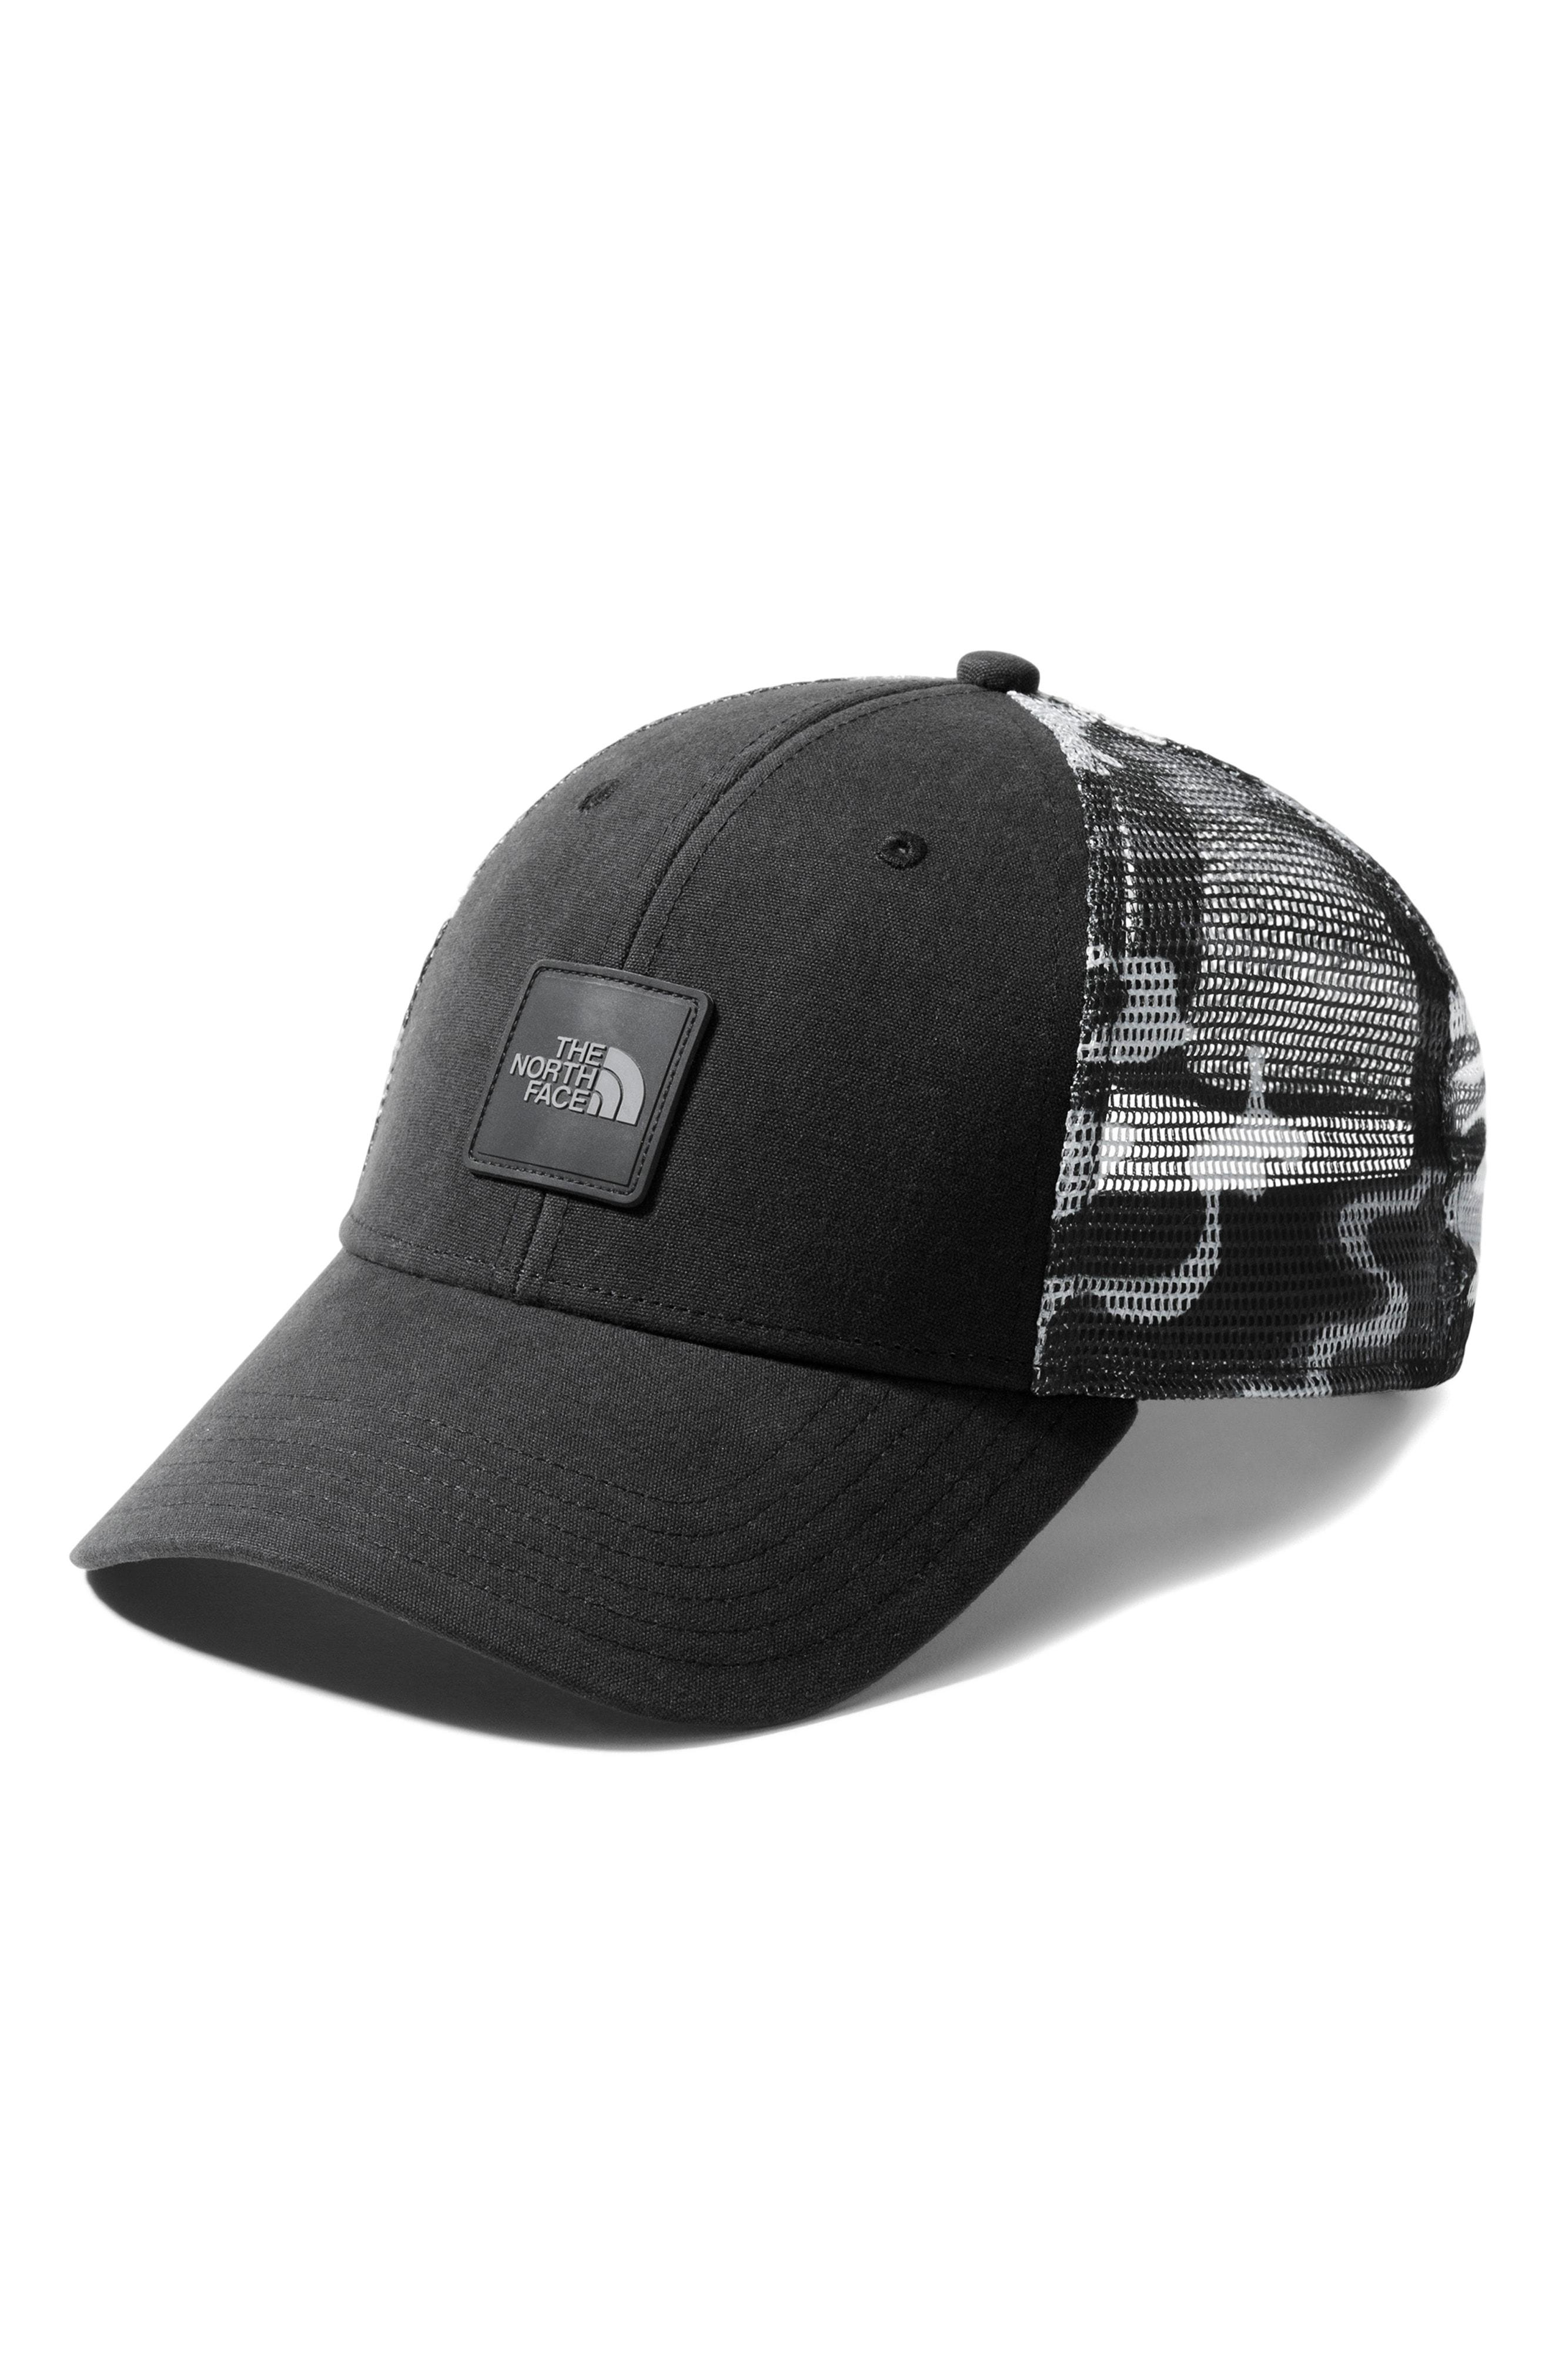 5fe69376b Lyst - The North Face Mudder Trucker Cap in Black for Men